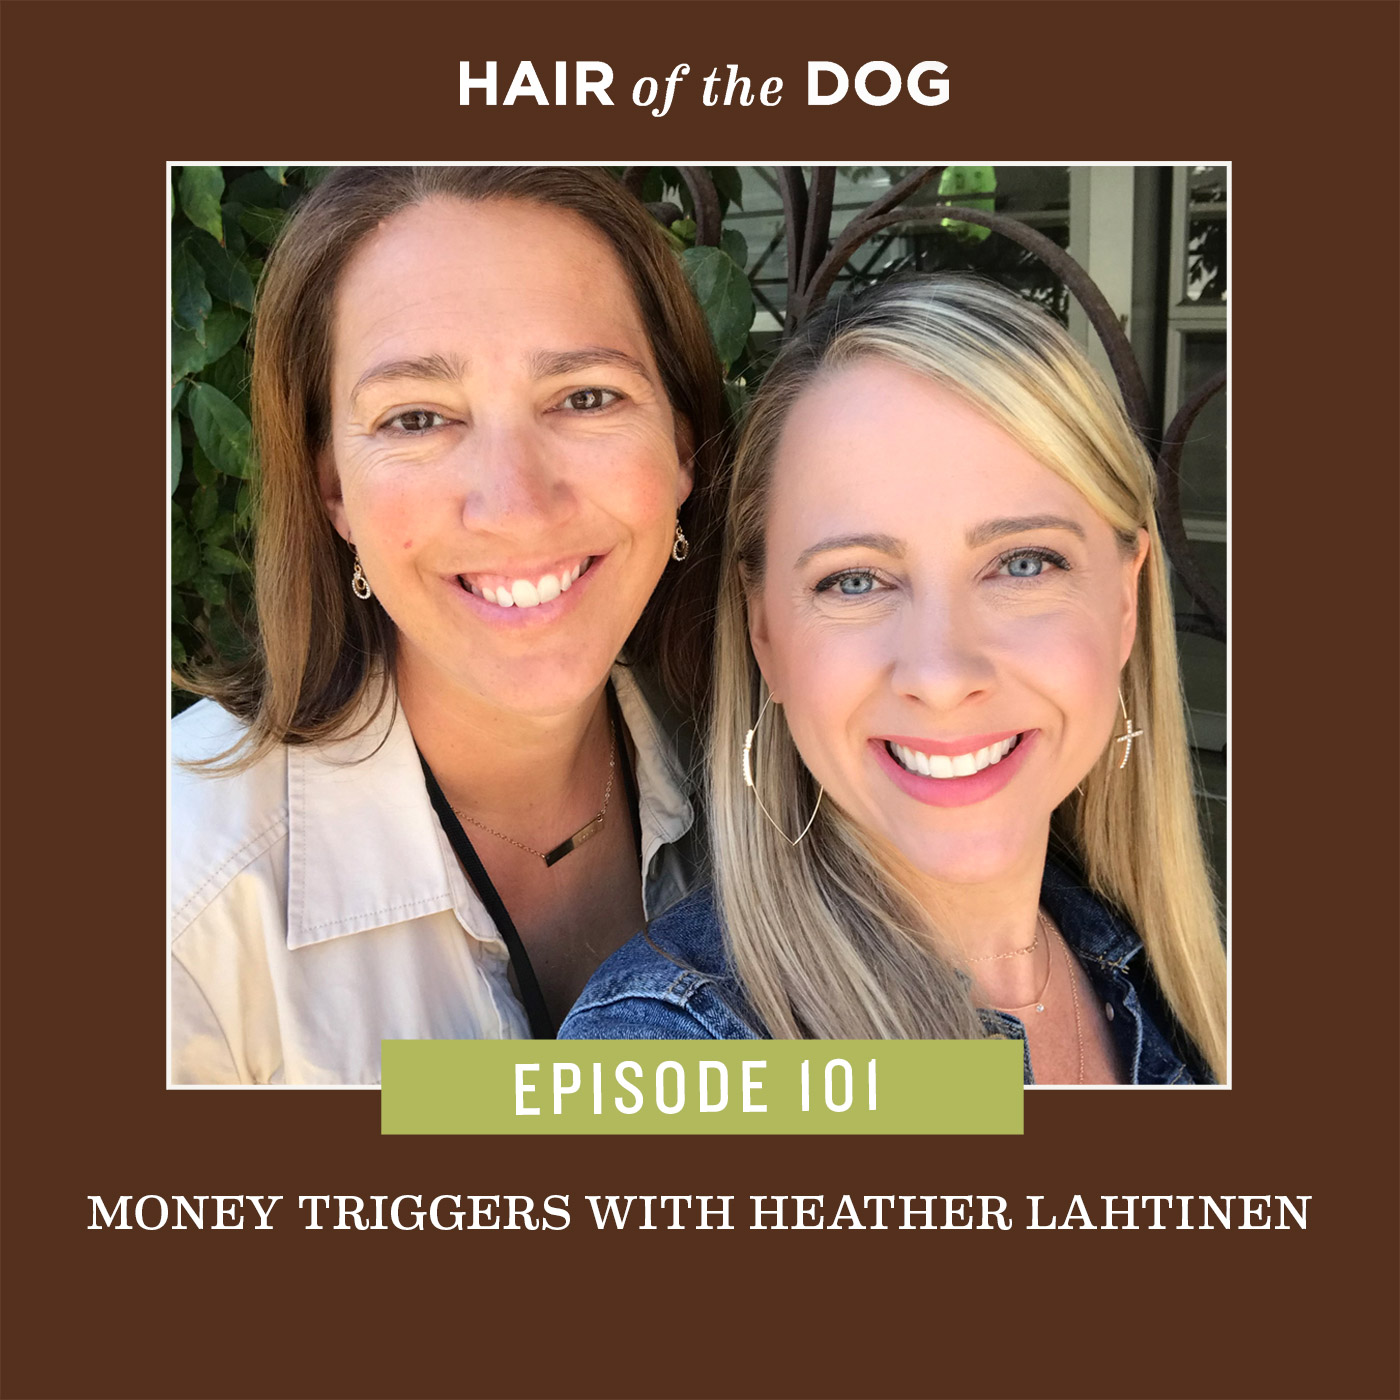 Money Triggers with Heather Lahtinen